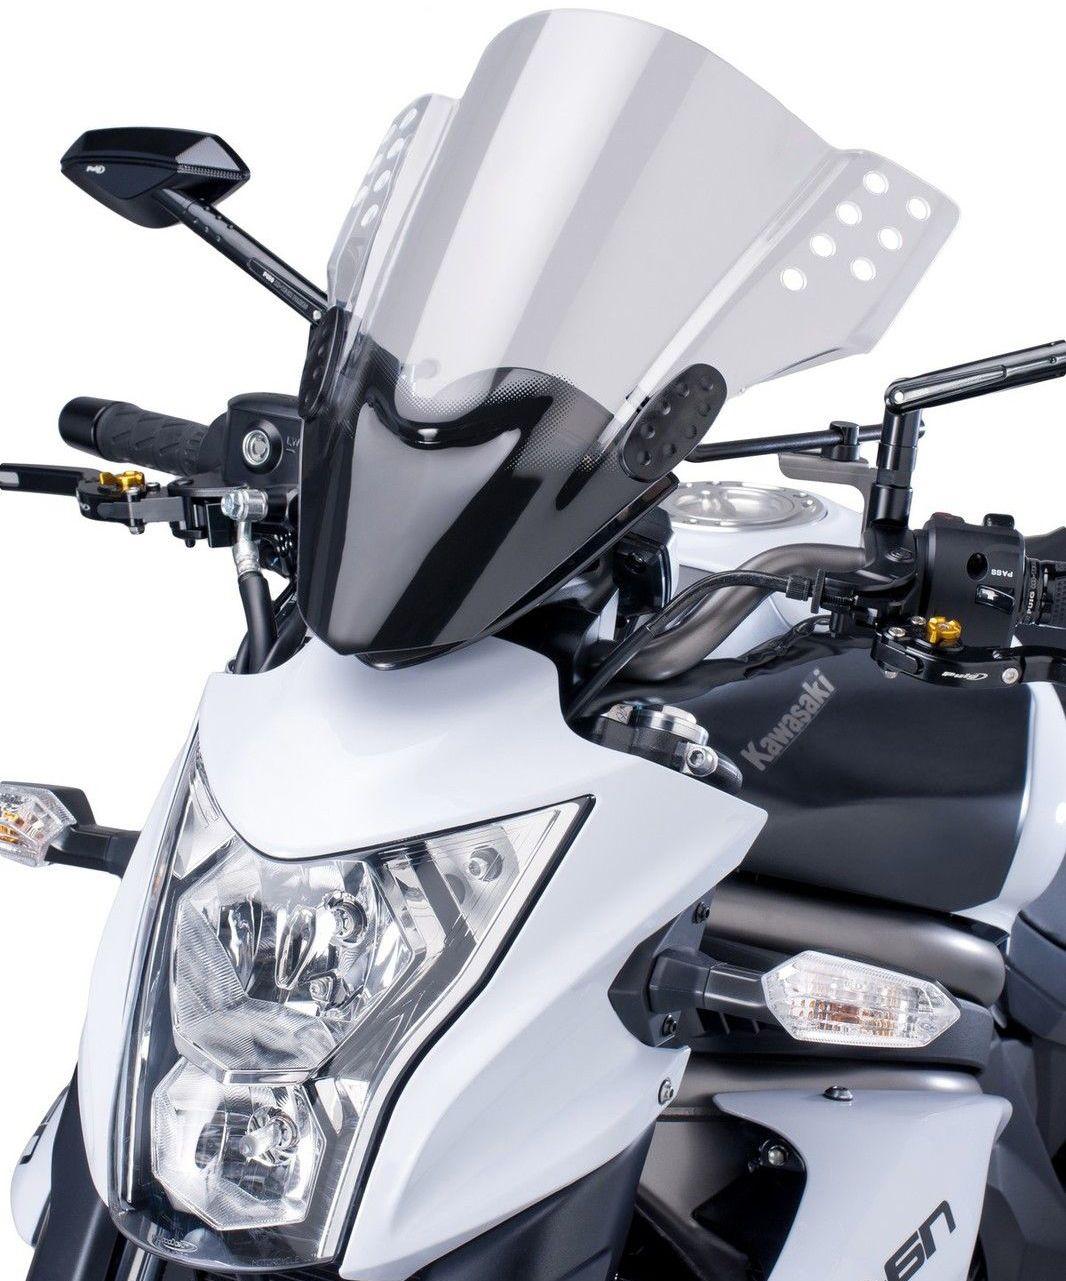 Motorcycle Race Windshield For Kawasaki Er6n 2012 2013 2014 2016 Er